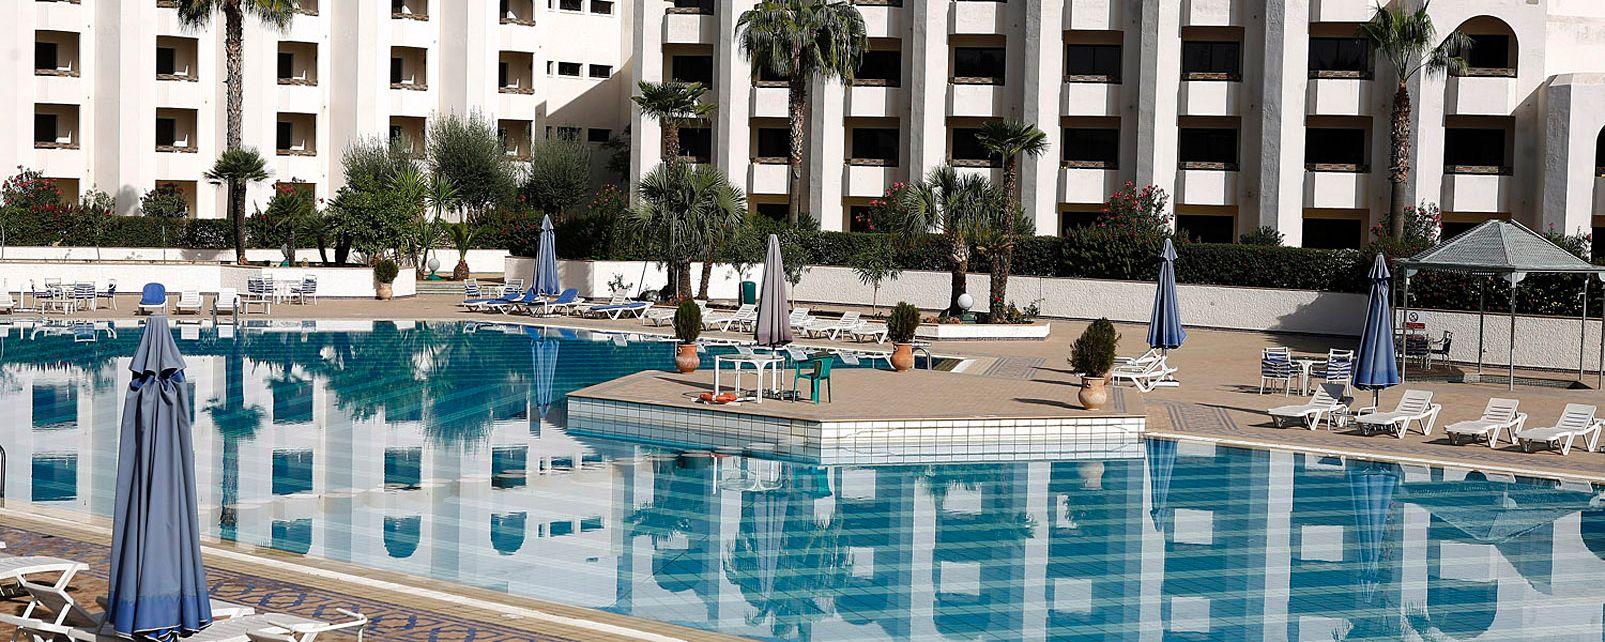 H tel jnane palace f s maroc for Hotel fes piscine